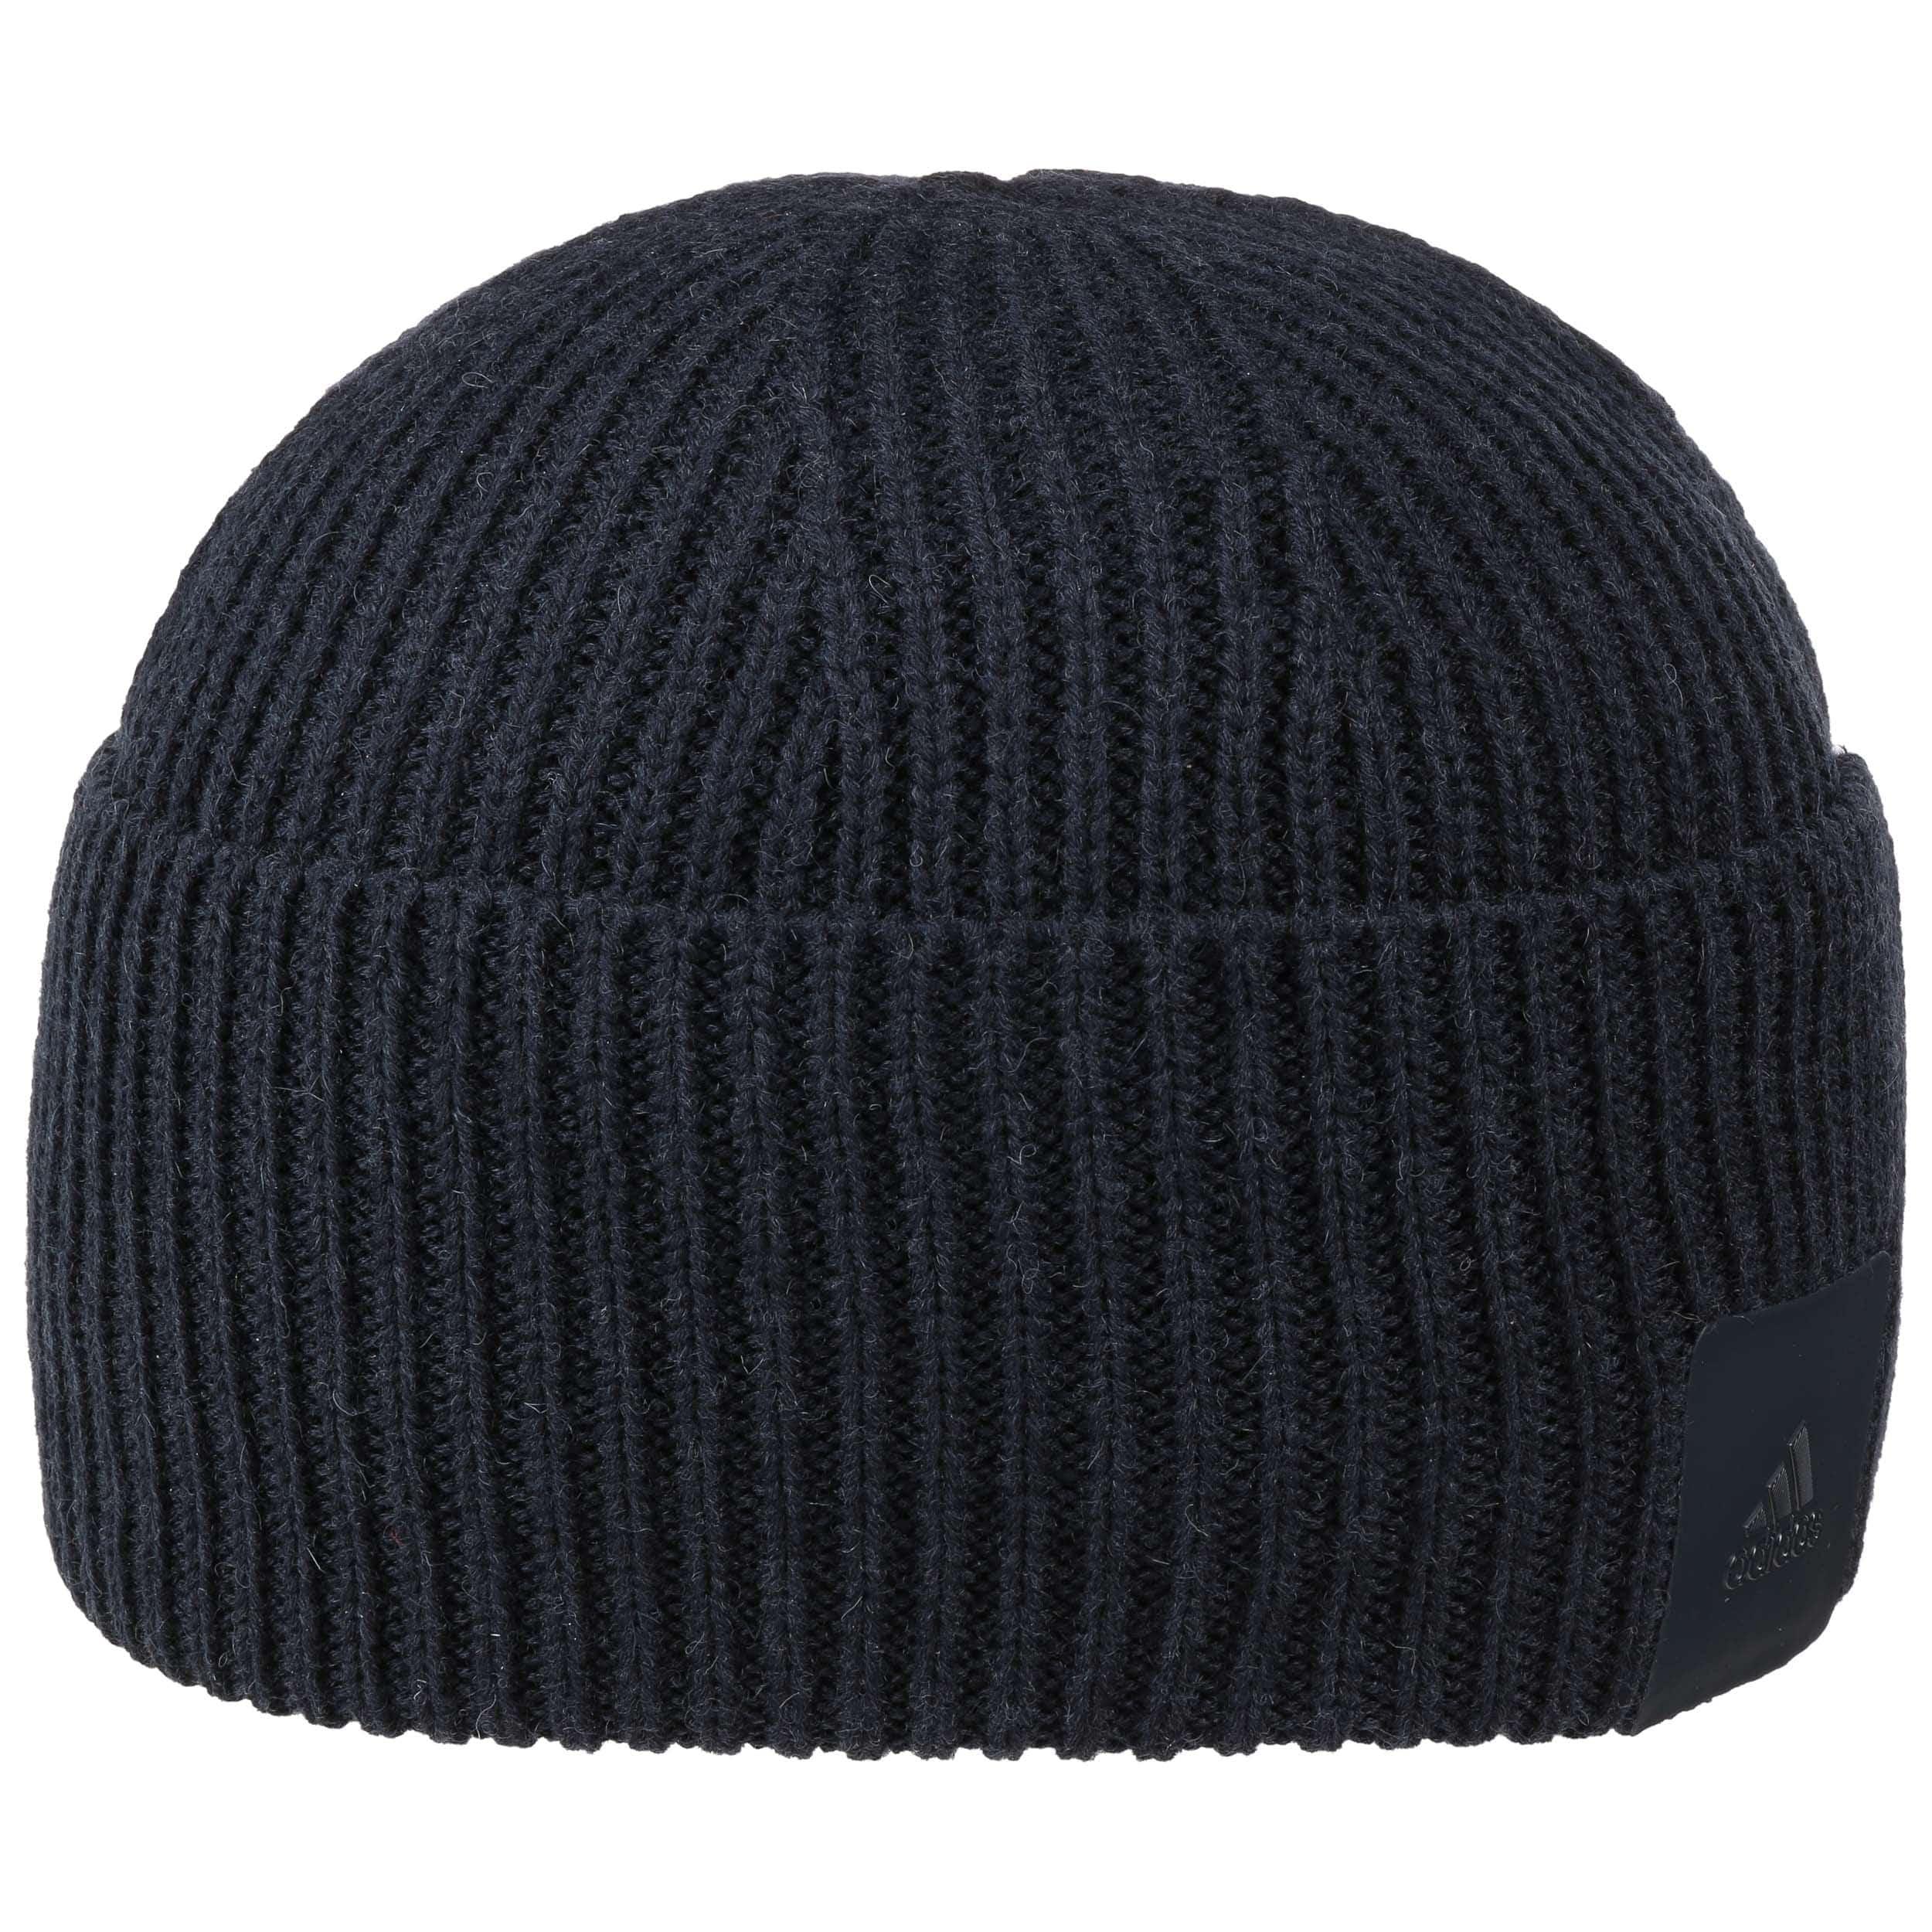 034185dd63e ... Premium Wool Beanie Hat by adidas - navy 4 ...